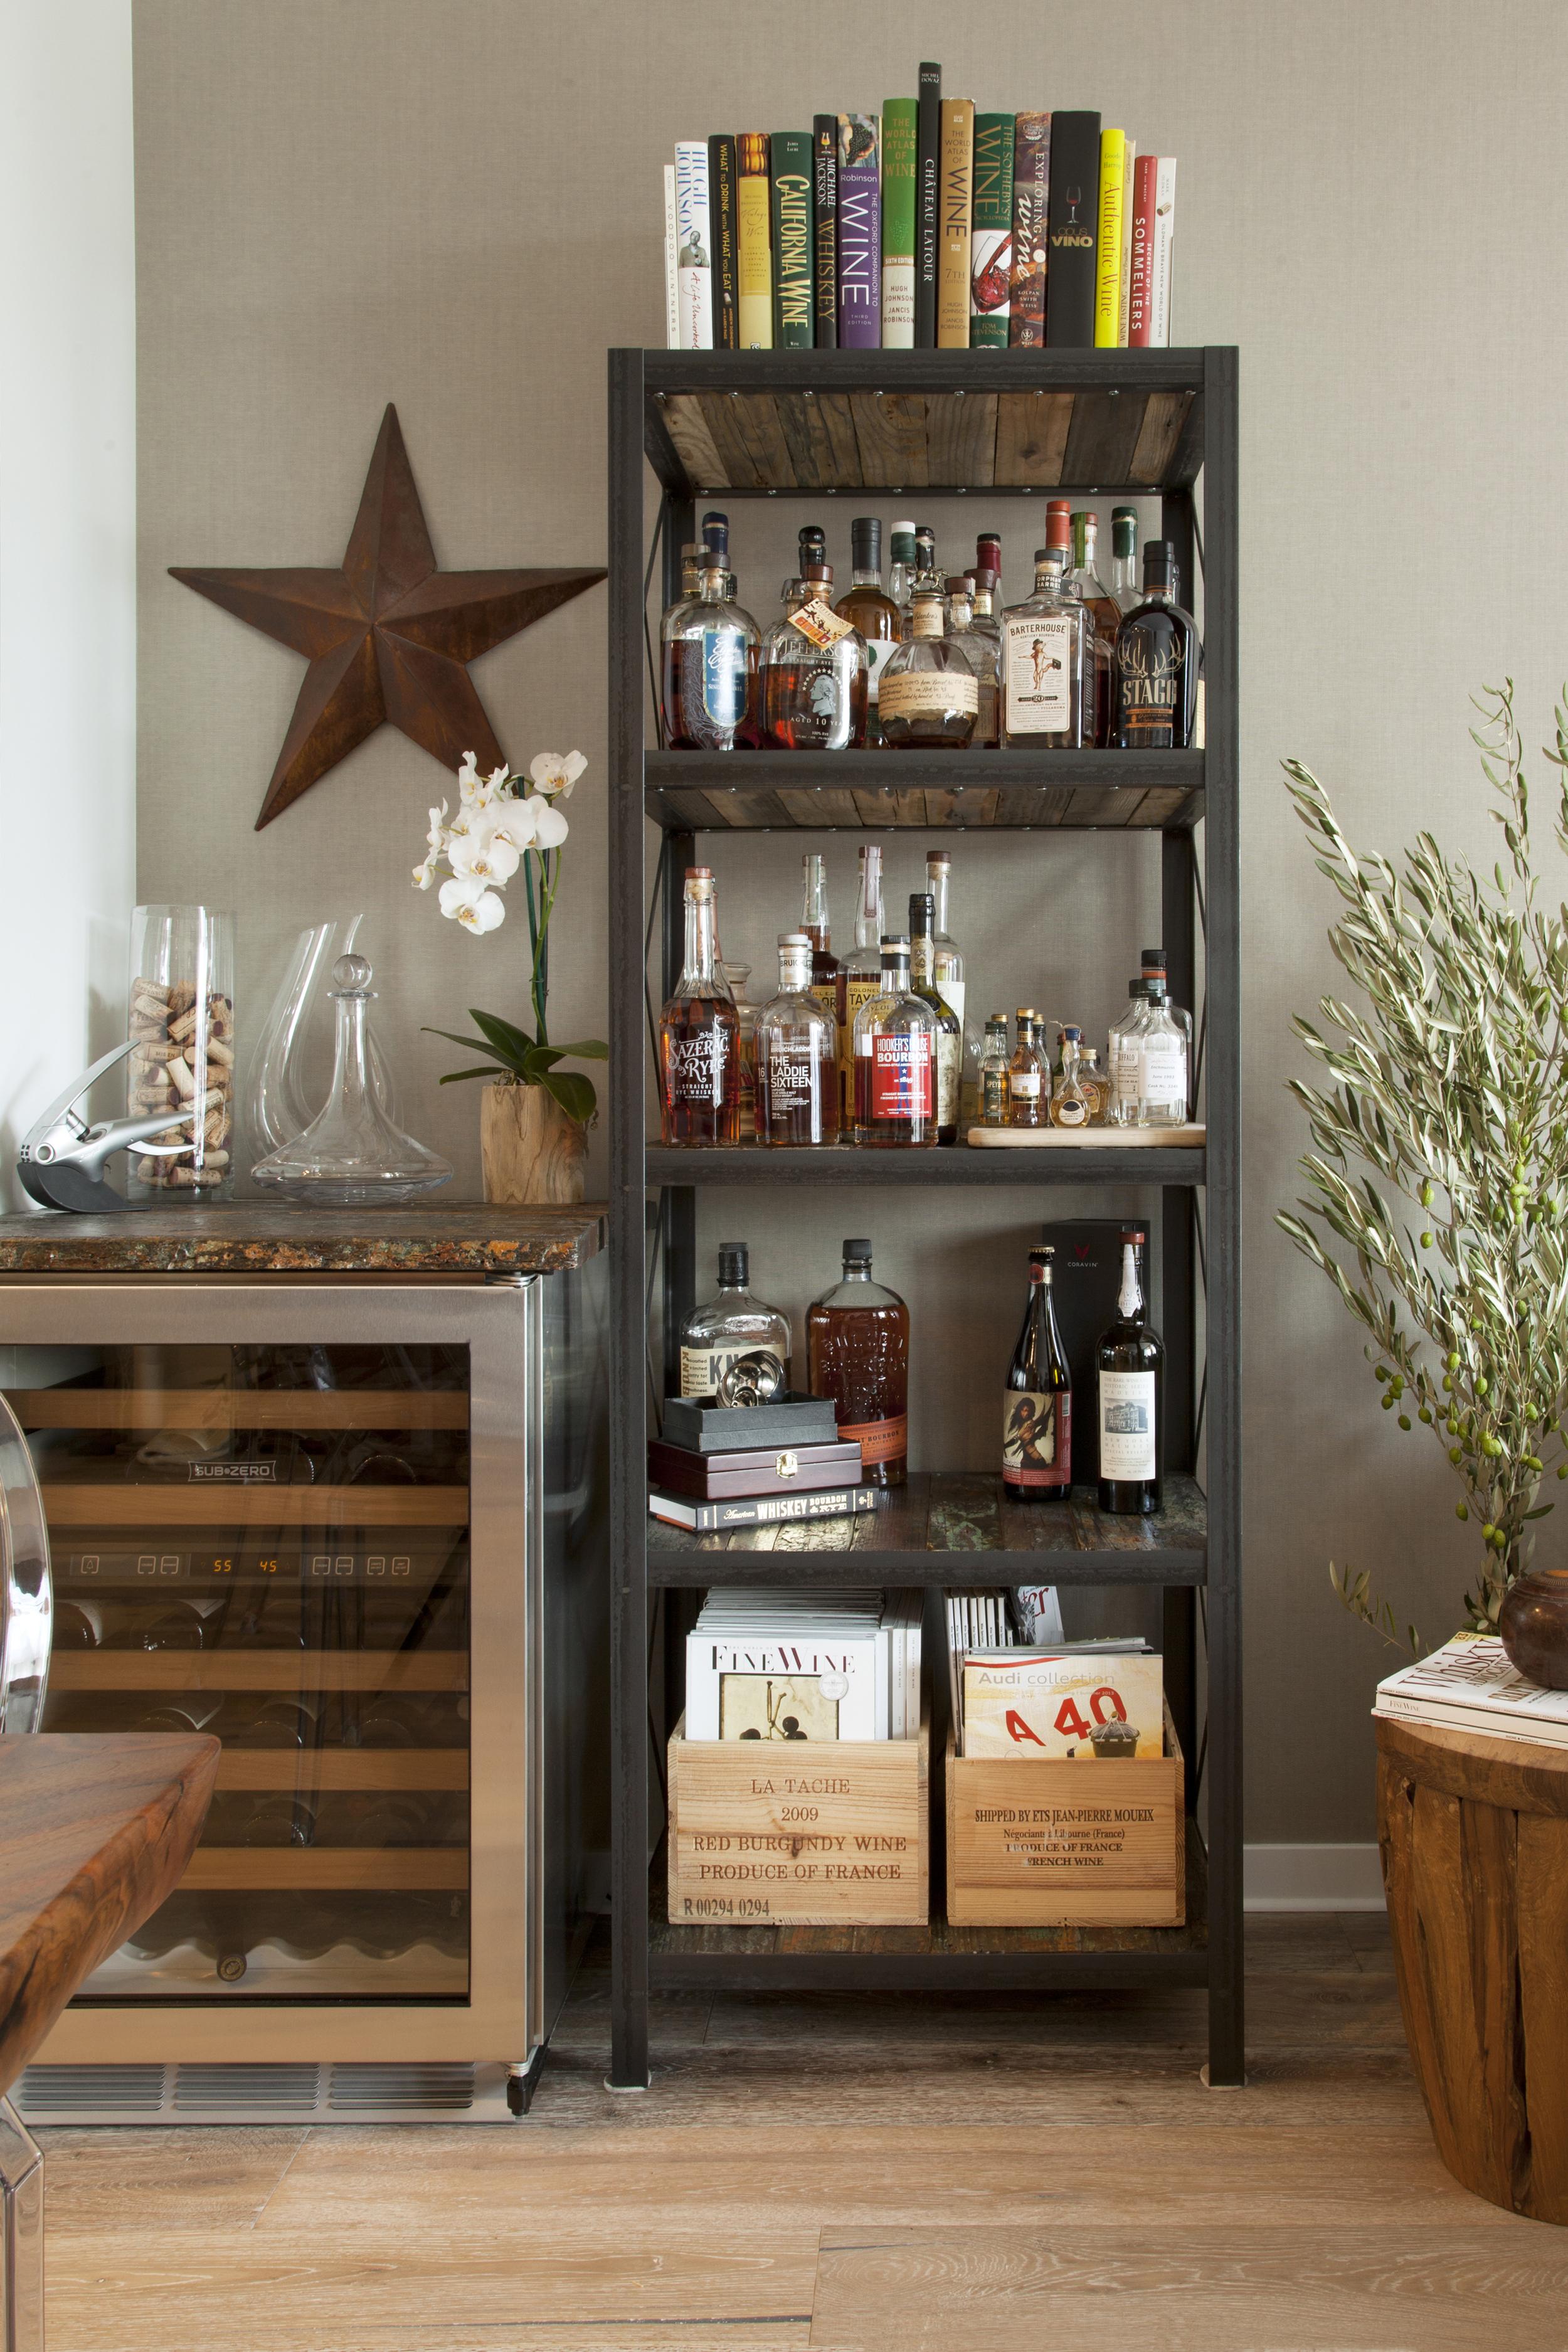 Liquor shelf and wine fridge